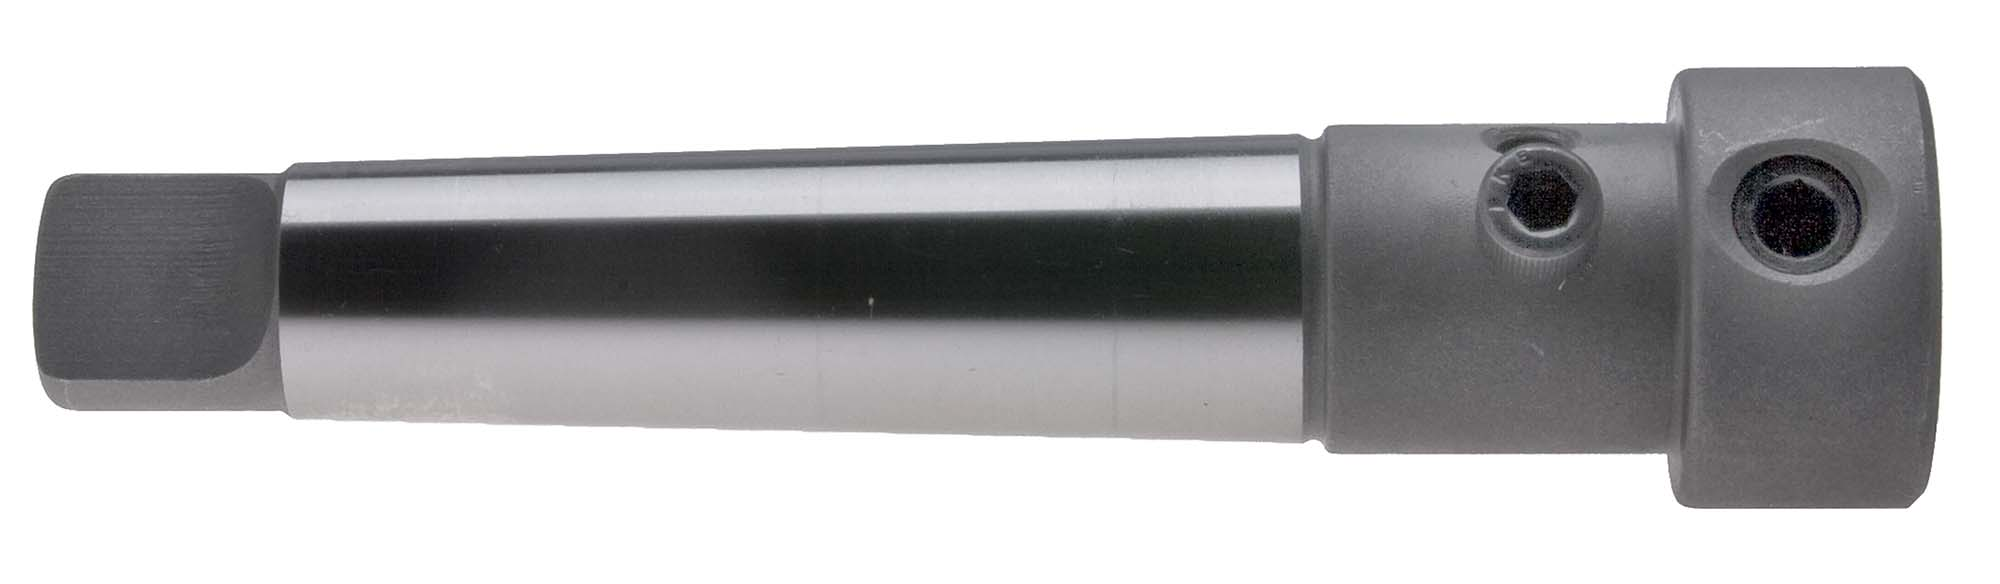 3 Morse Taper Annular Cutter Holder